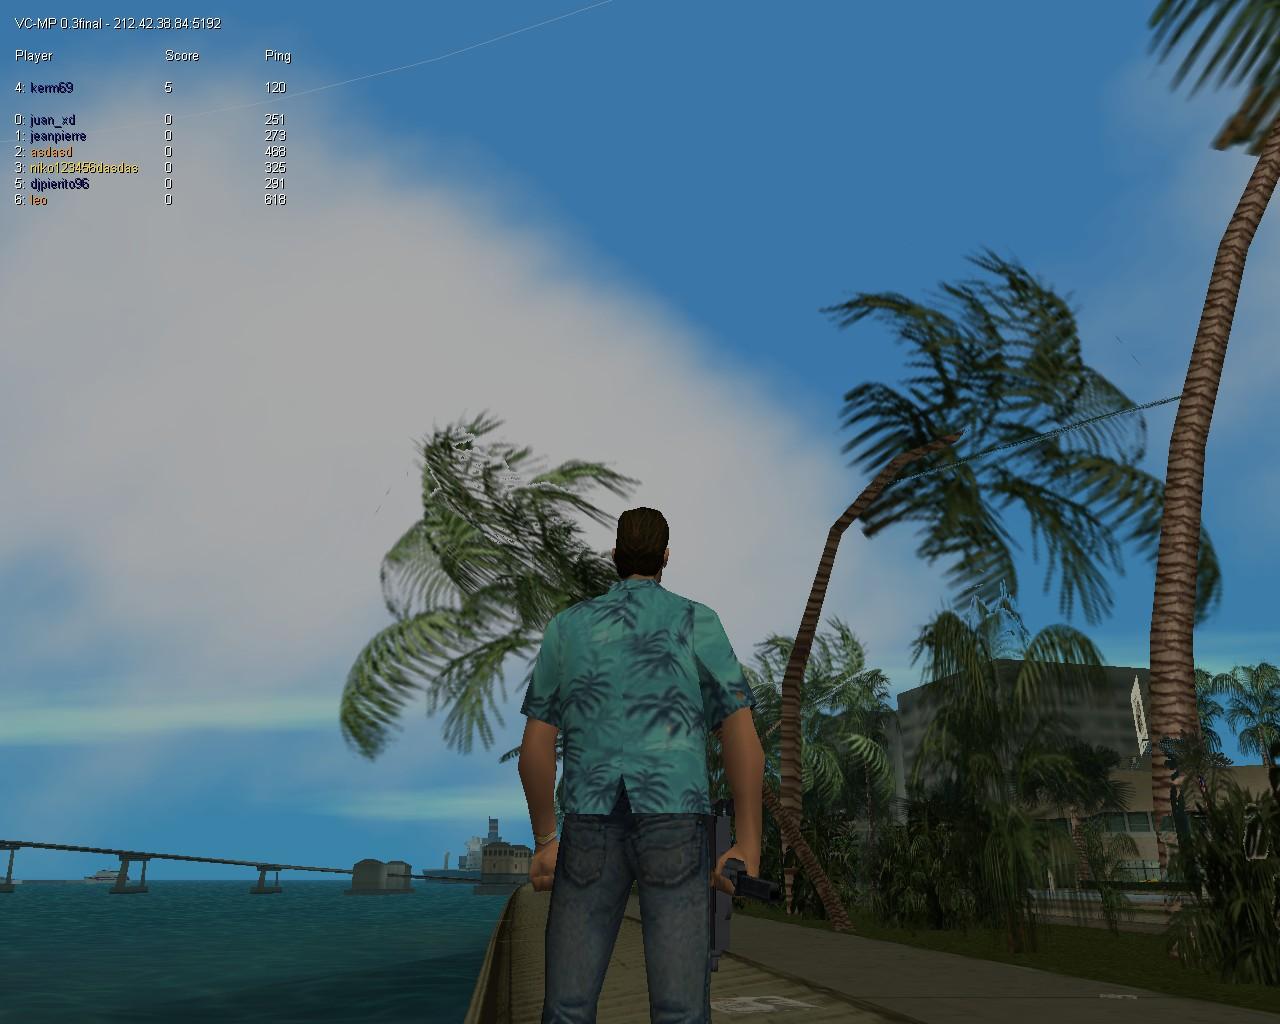 Игроки на сервере где-то в 04:00 AM - Grand Theft Auto: Vice City